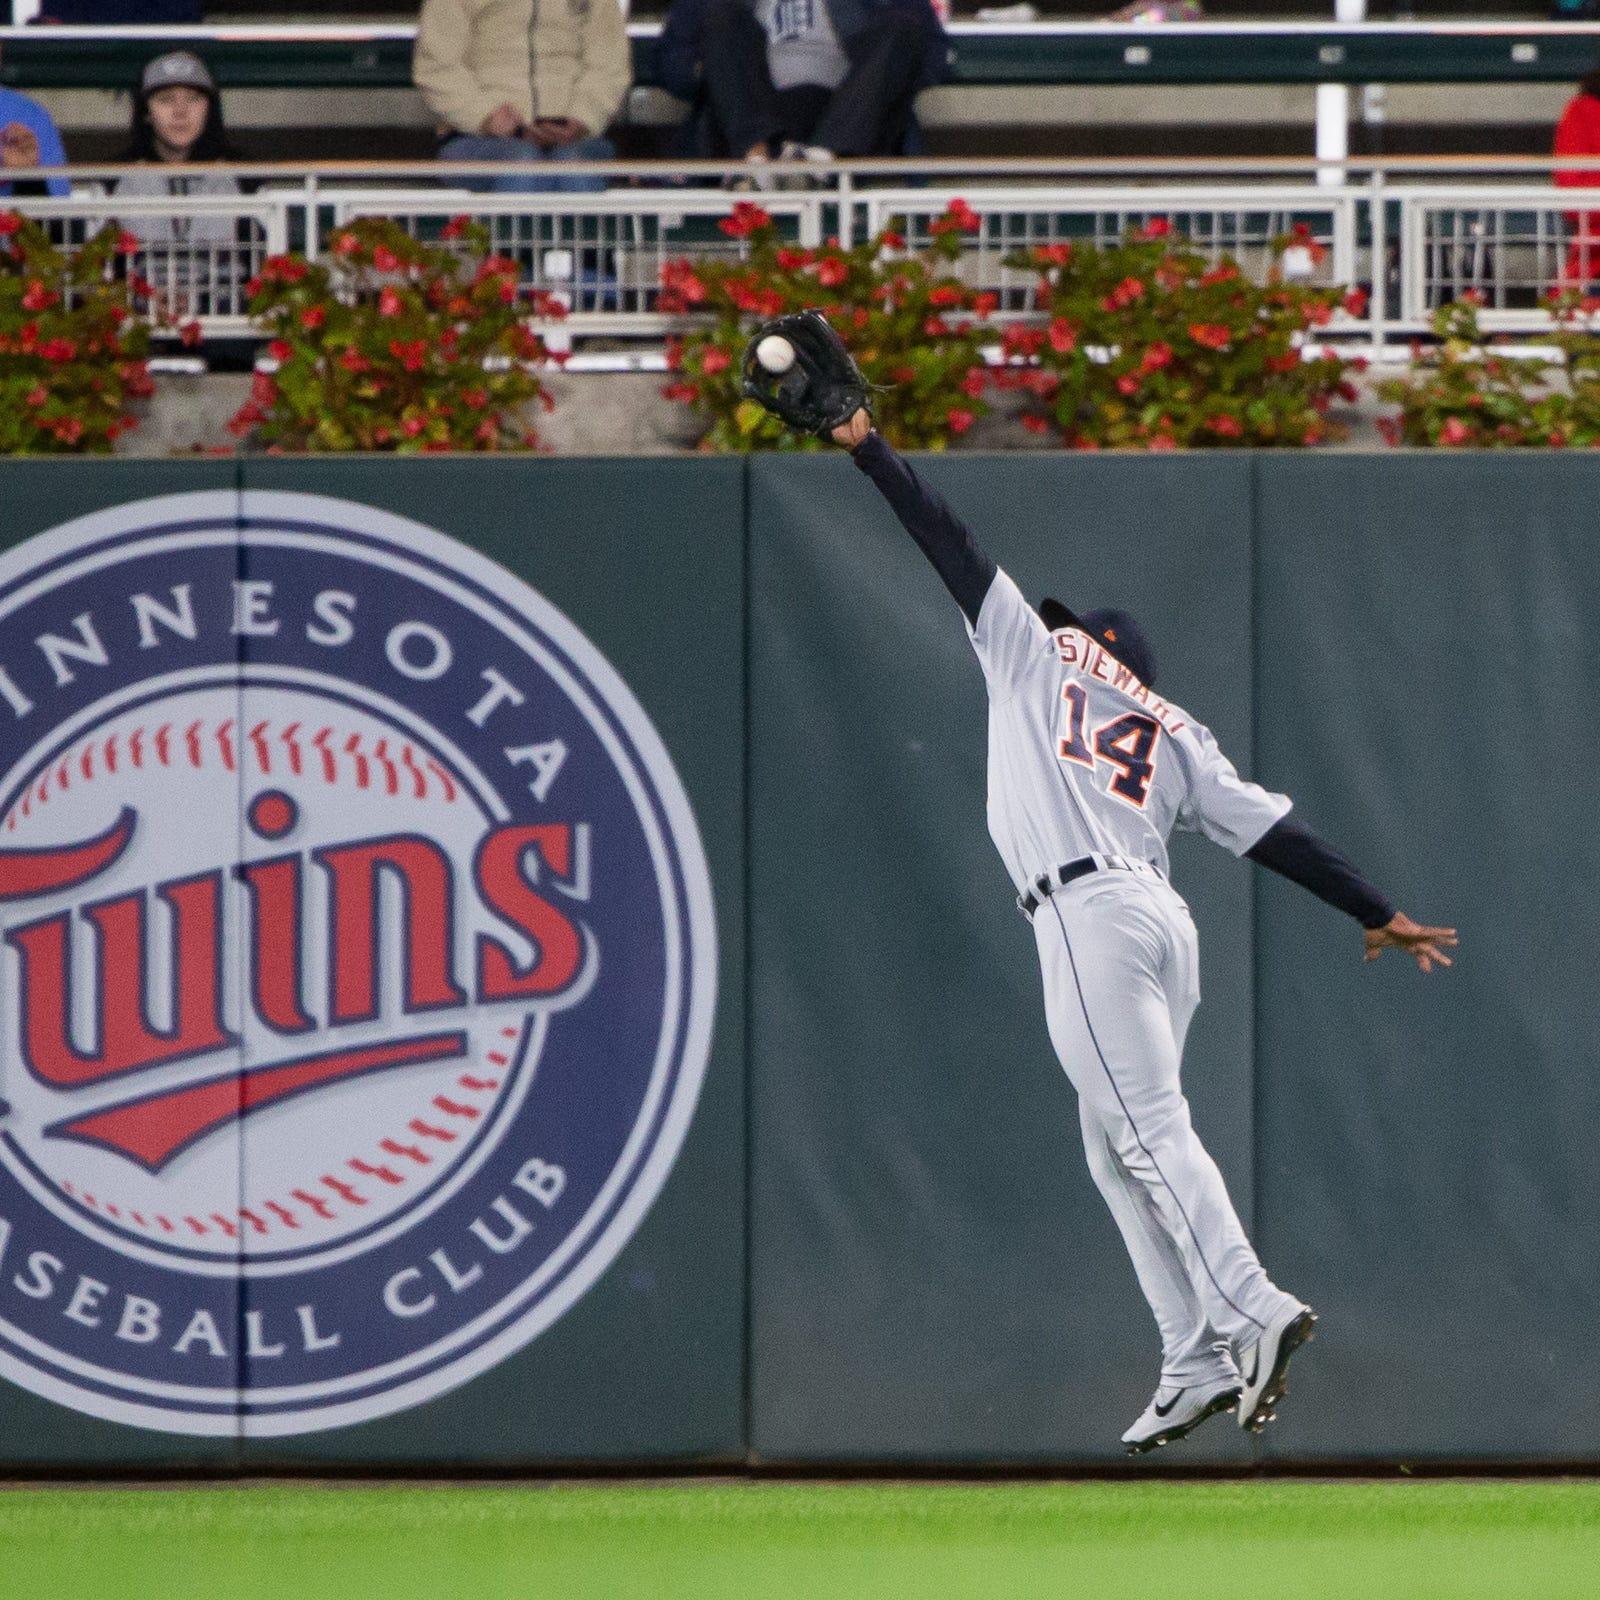 Detroit Tigers find bright spot despite latest loss, 9-3 to Twins